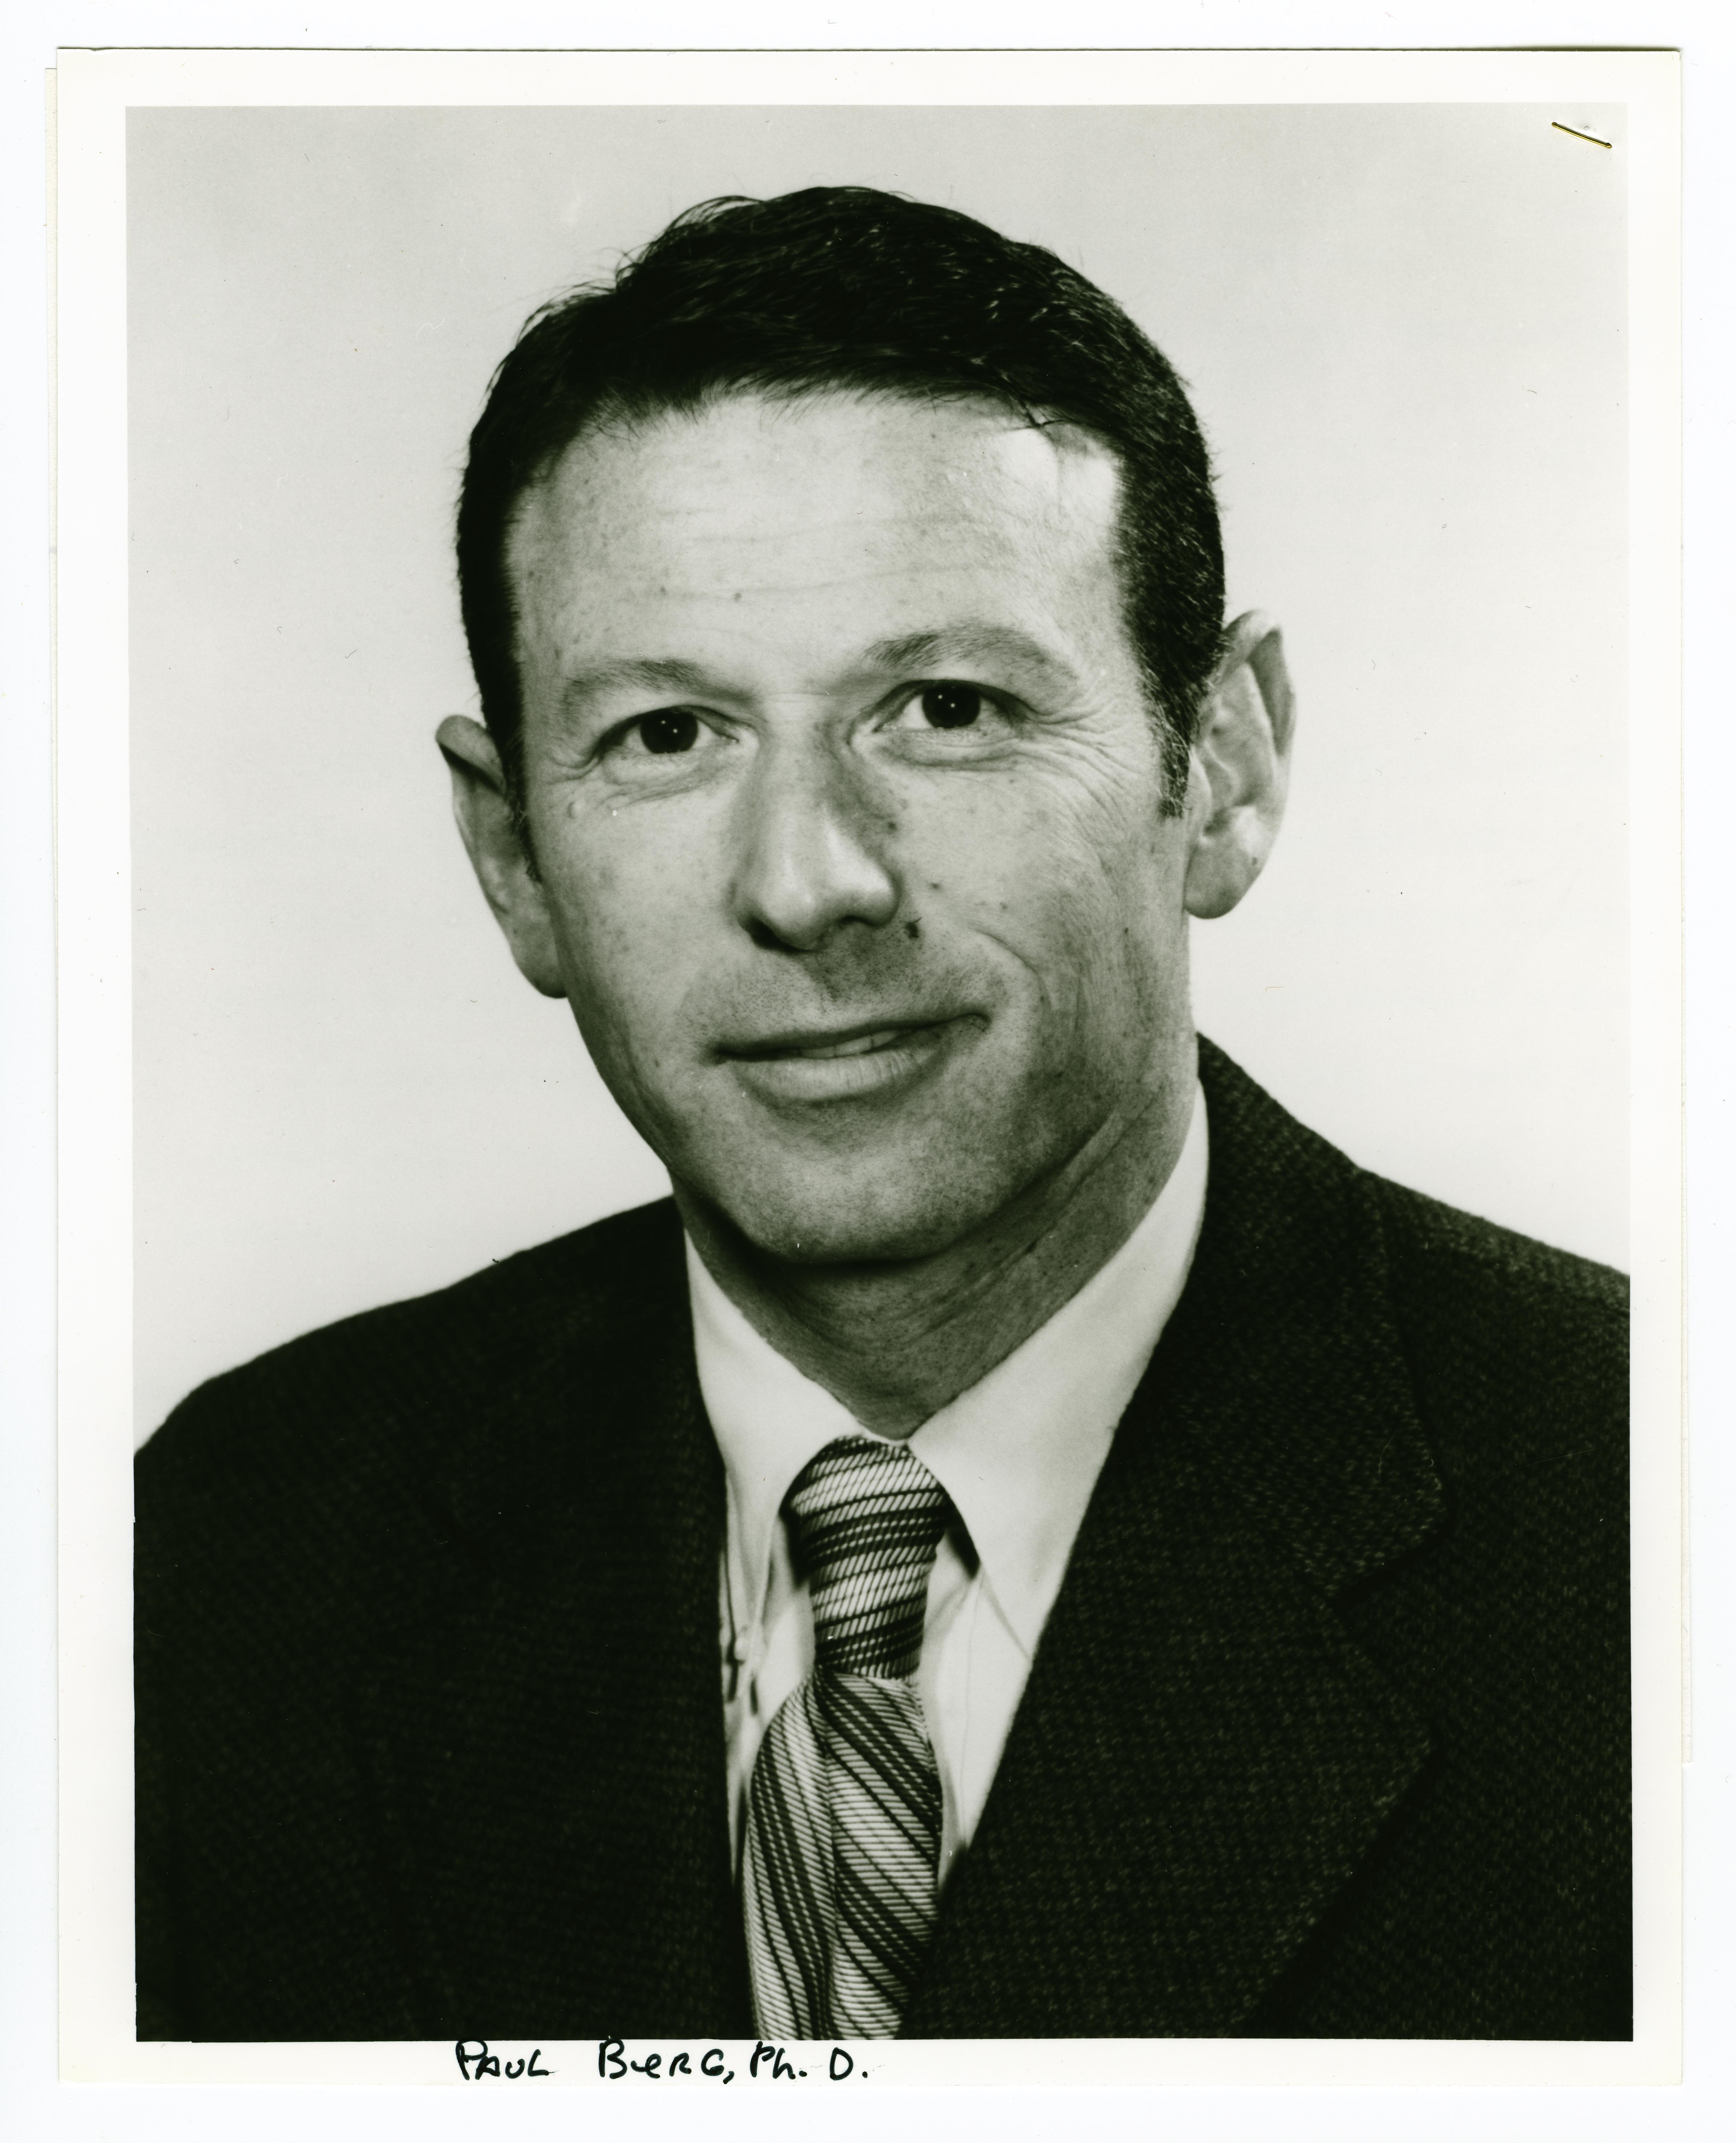 Genetic engineering wikipedia - Paul Berg 1980 Albert Lasker Basic Medical Research Award Winner